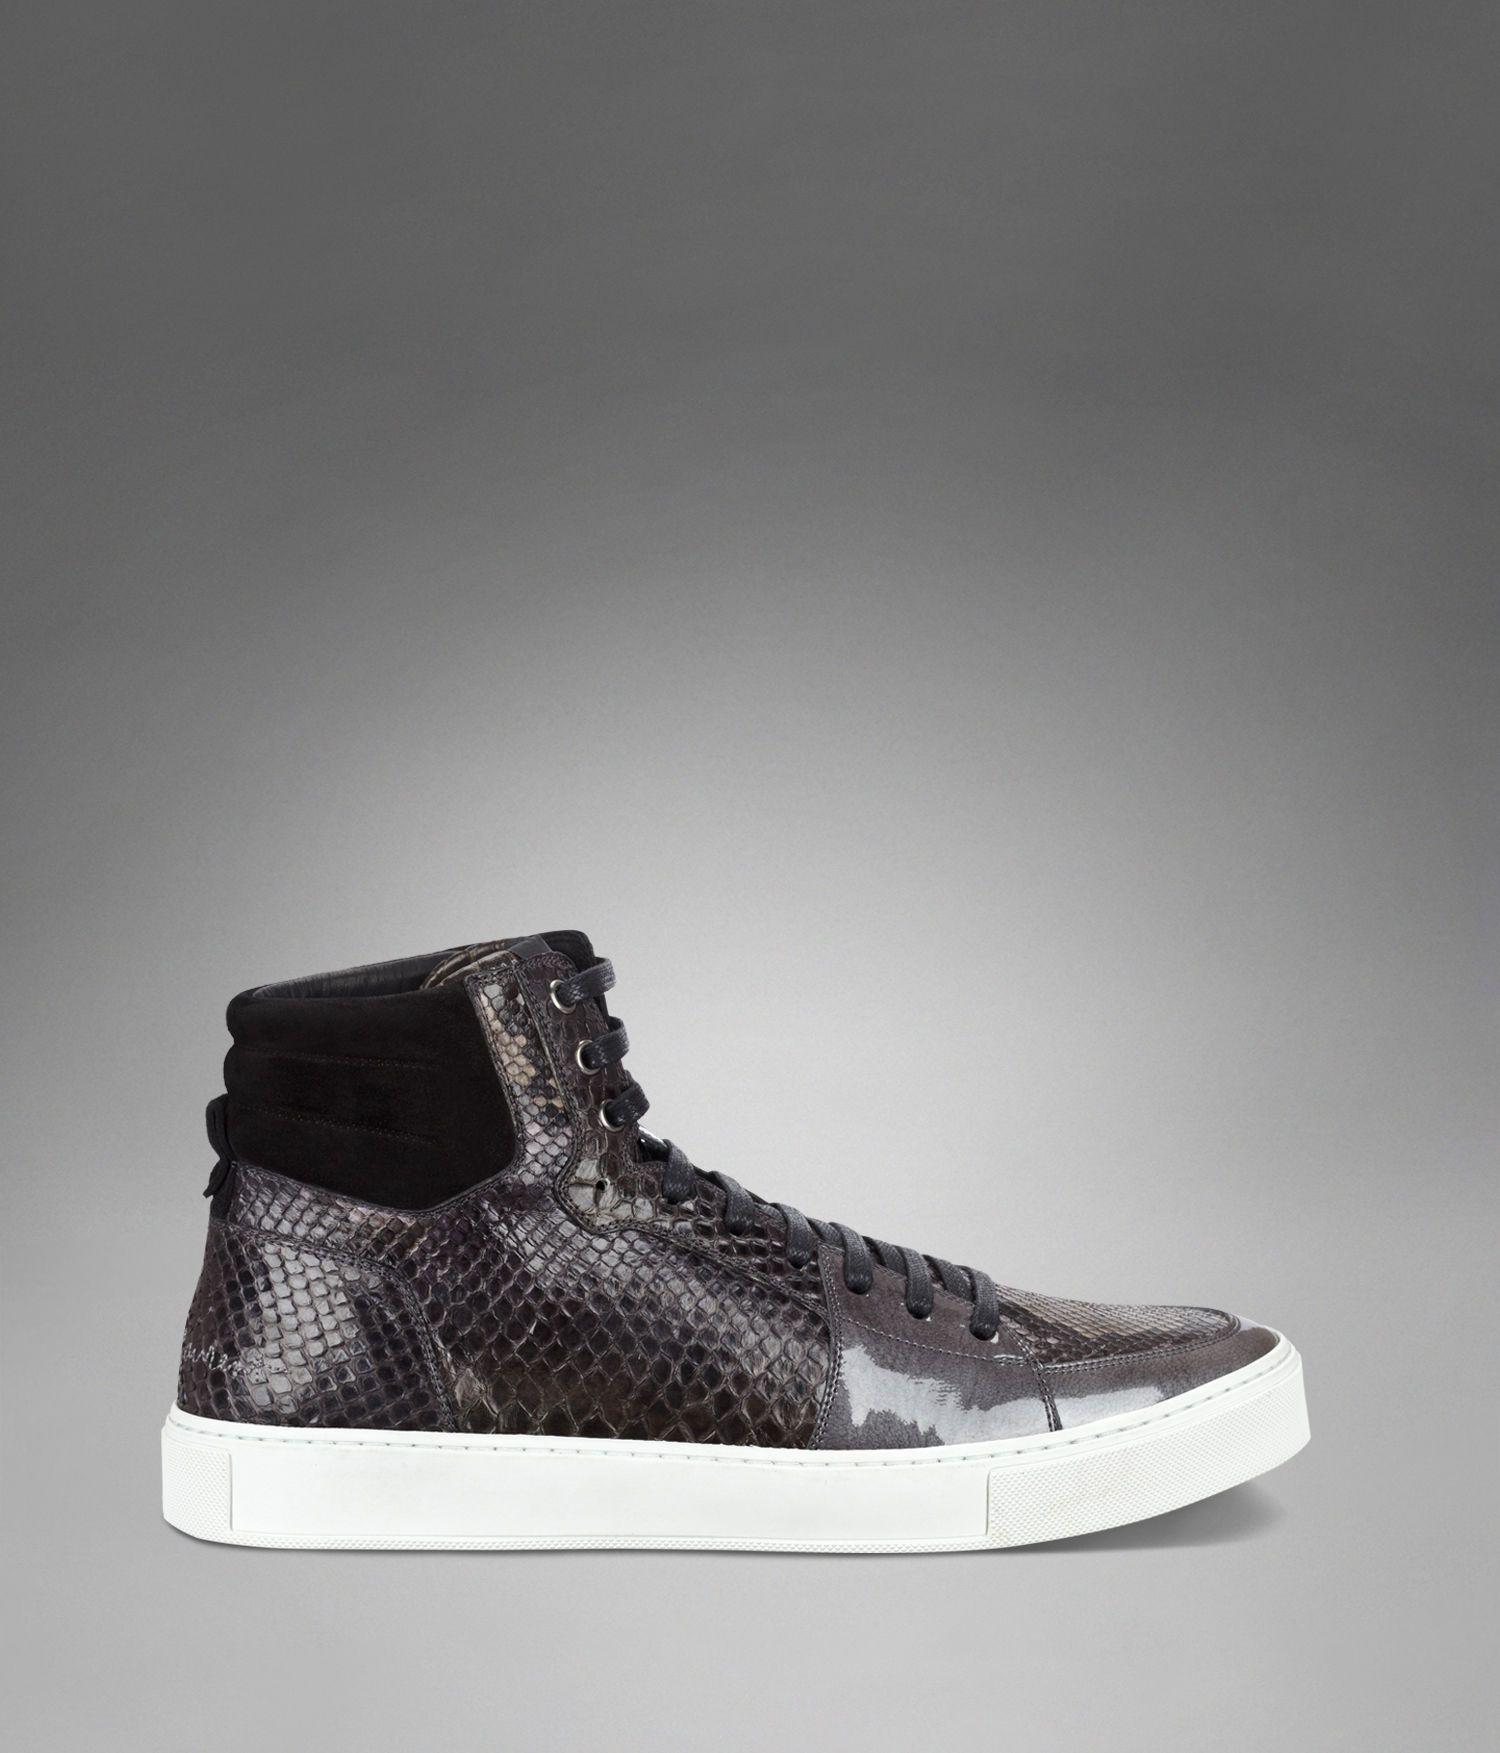 8b7e1e91 YSL Malibu High-Top Sneaker in Black Suede, Grey Patent Leather and ...